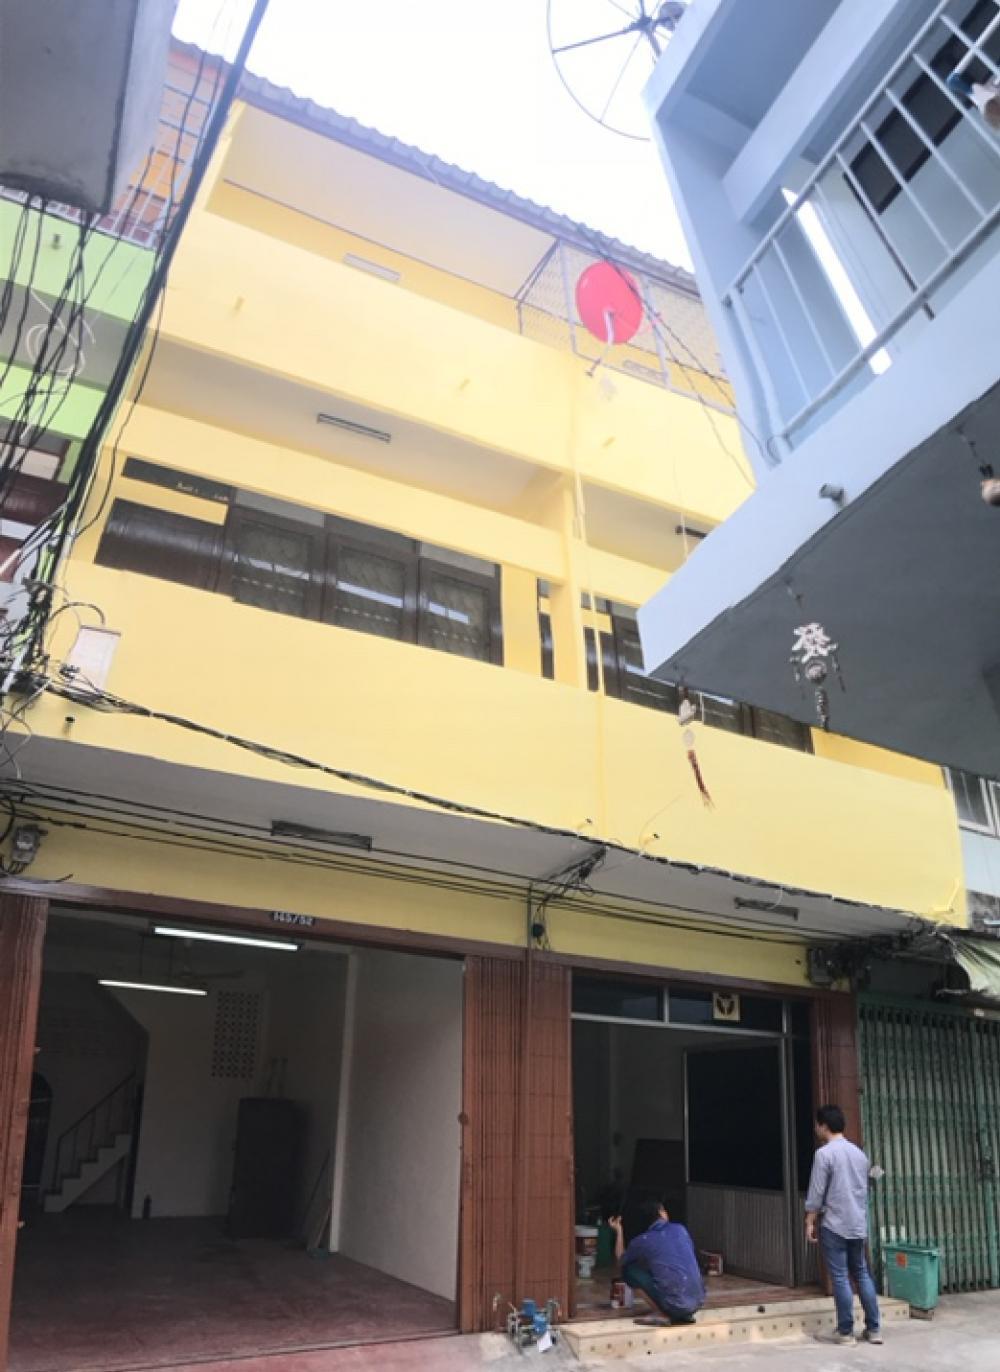 For SaleShophouseWongwianyai, Charoennakor : ขายตึกแถว ทำเล ซ.หิรัญรูจี ติดราชภัฏบ้านสมเด็จ 2 คูหา ไม่ตีทะลุ เข้าออกได้ 2 ทาง วงเวียนใหญ่-สี่แยกบ้านแขก